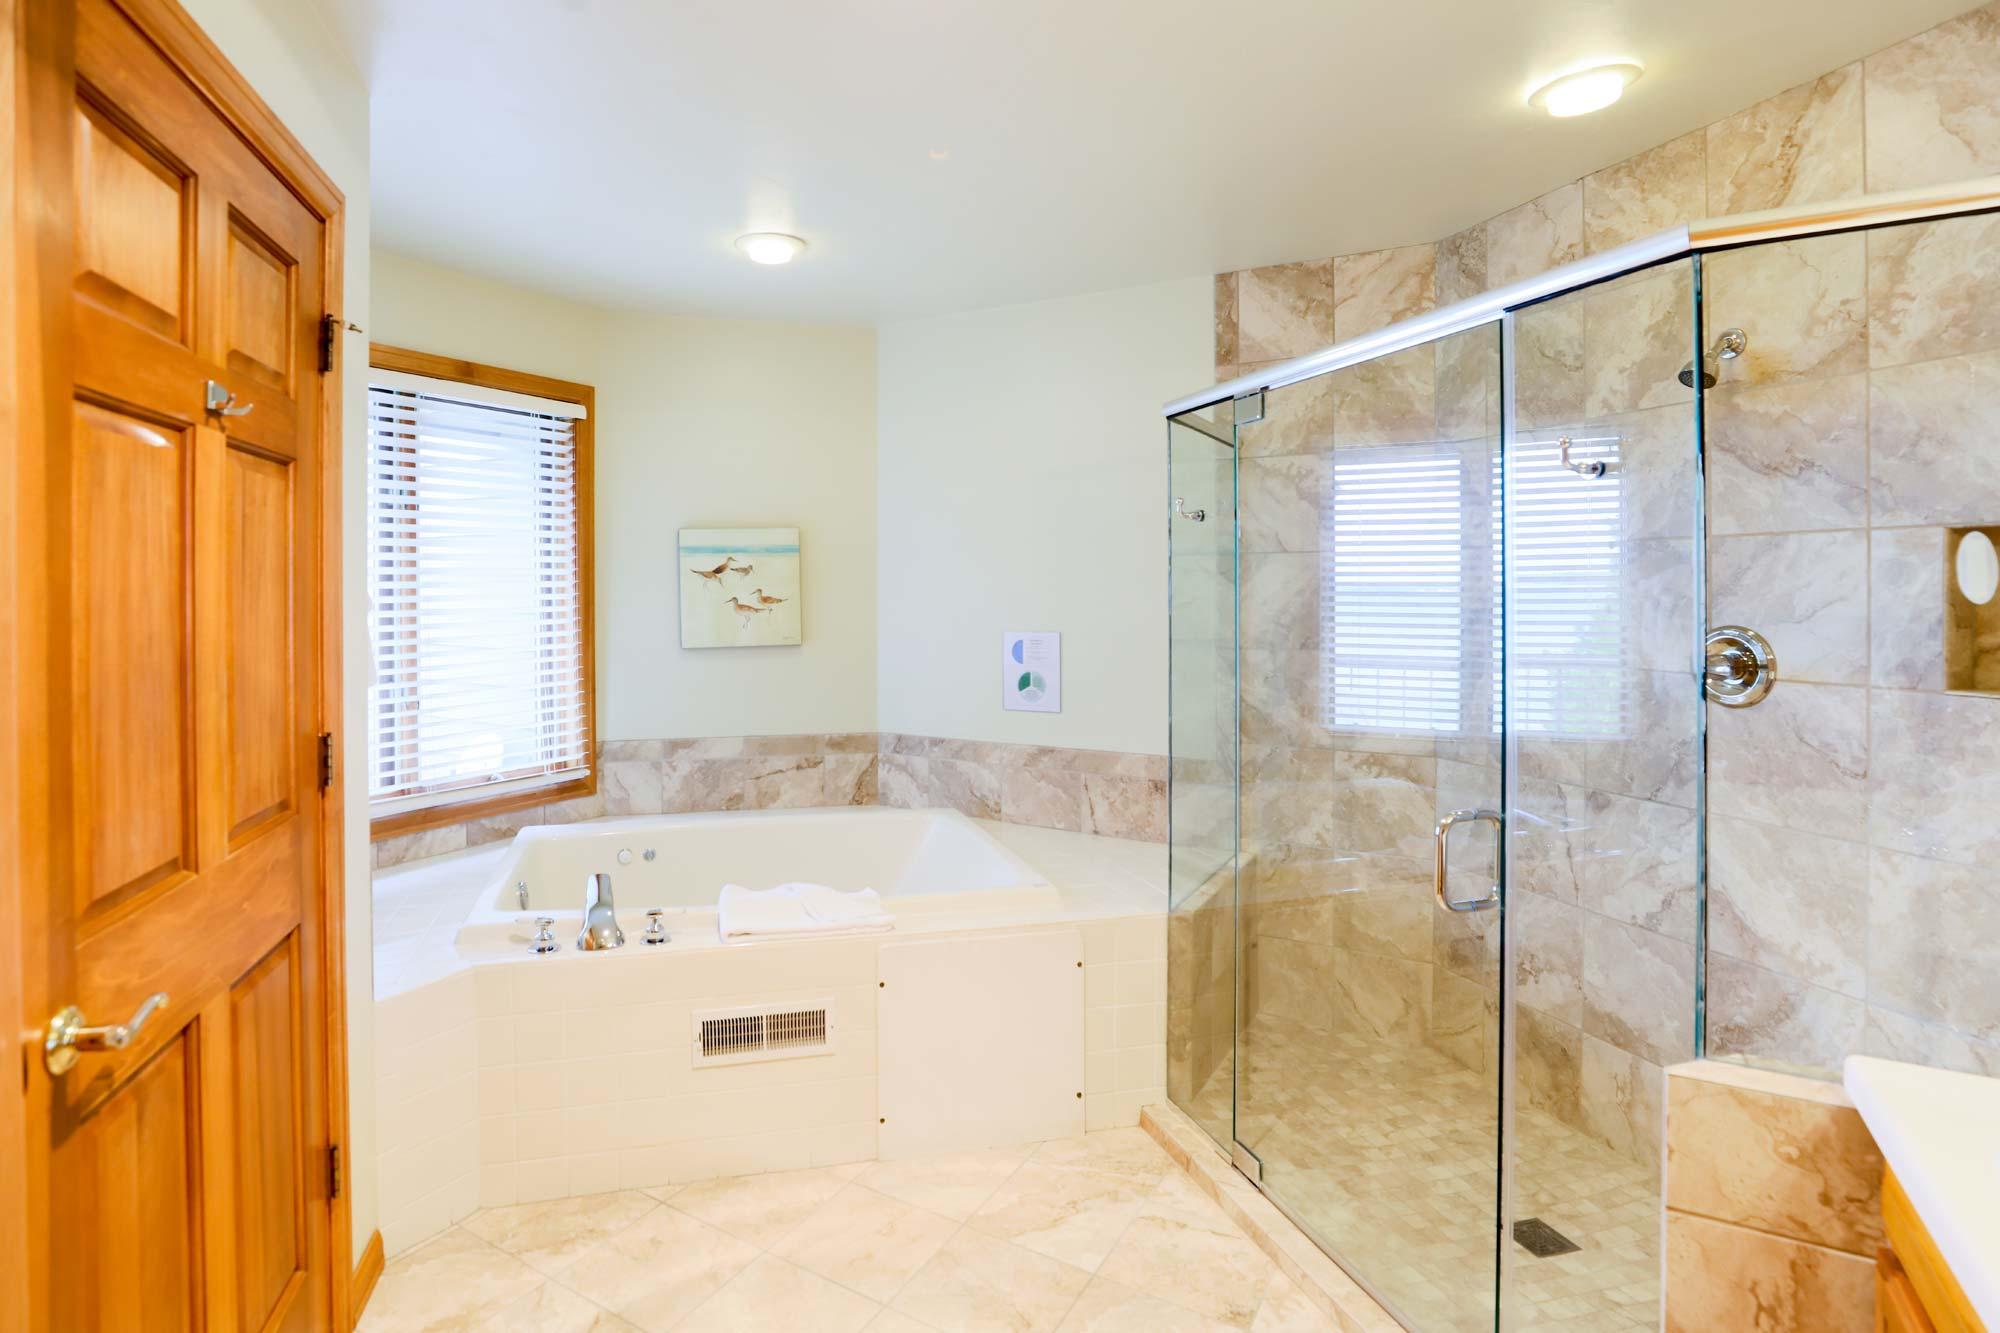 Bathroom of Two Bedroom Condo Suite at Door County Hotel and Resort